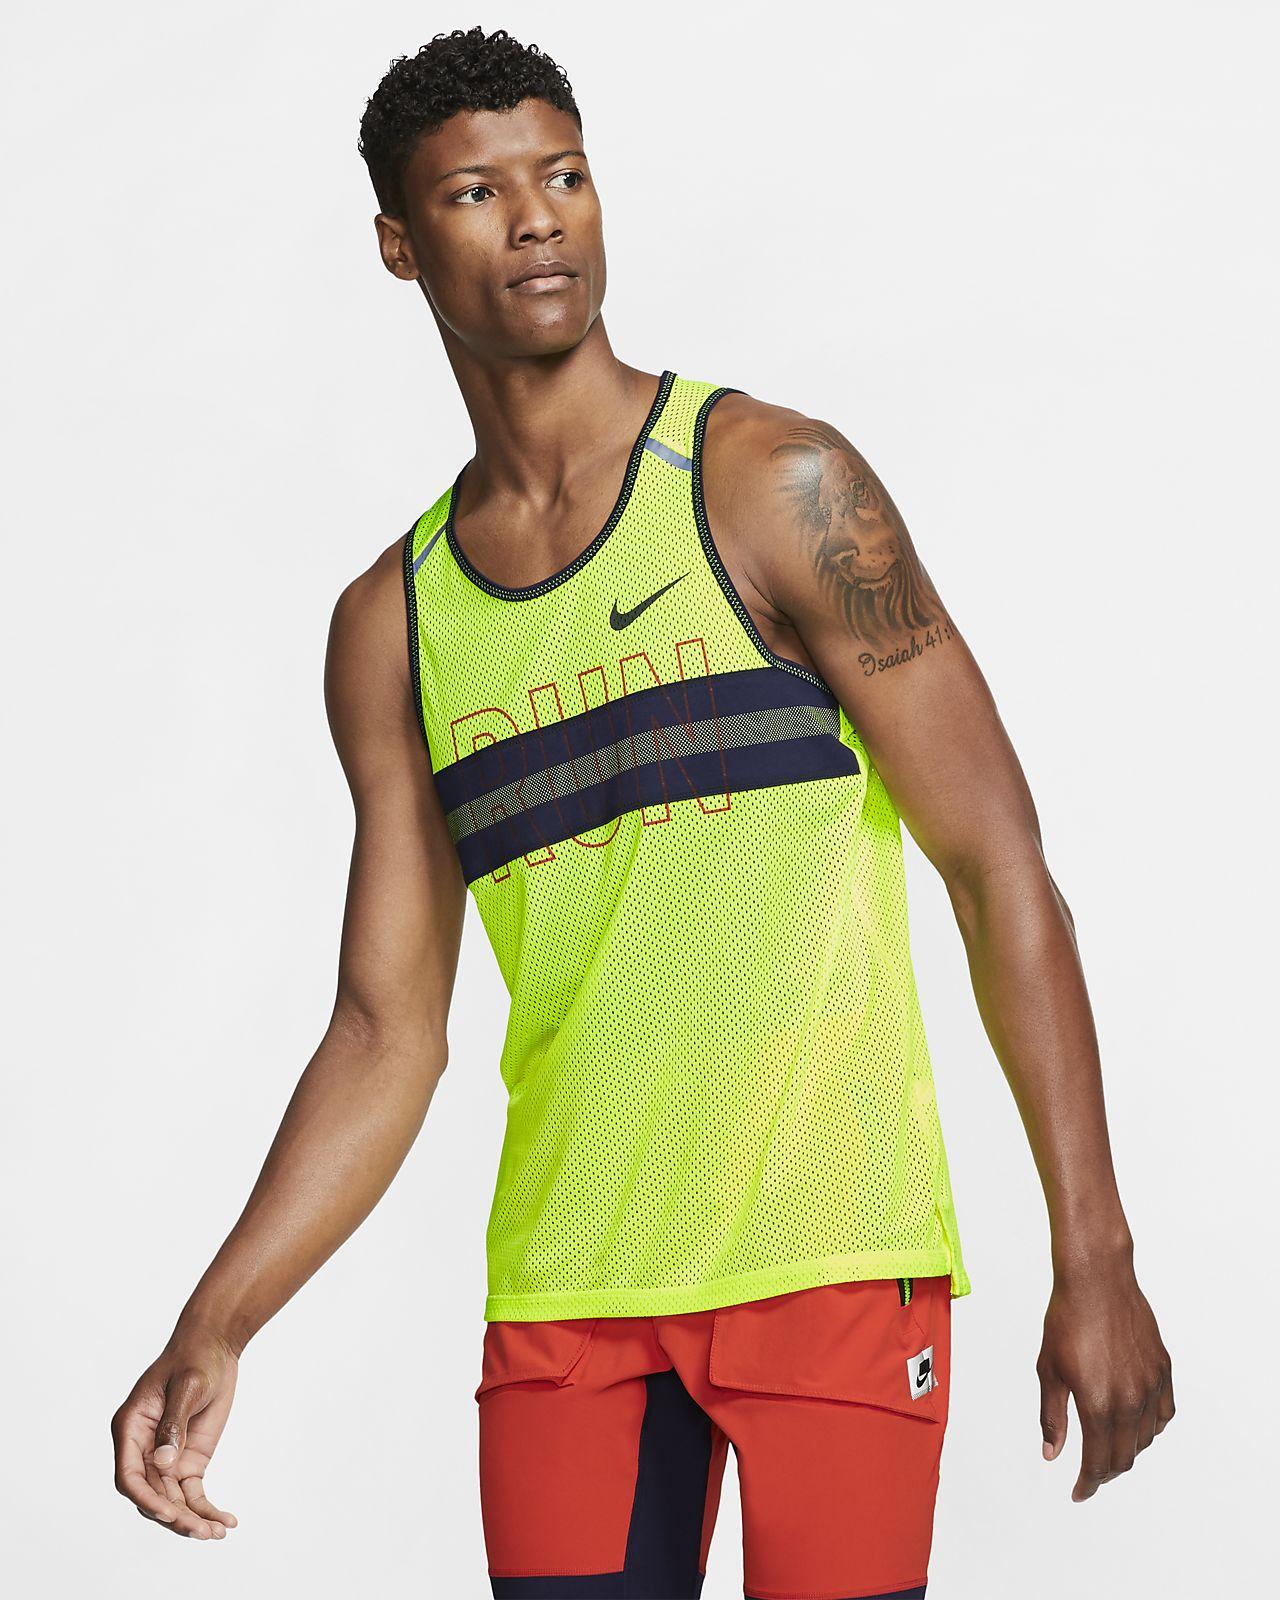 Pánské běžecké síťované tílko Nike Wild Run